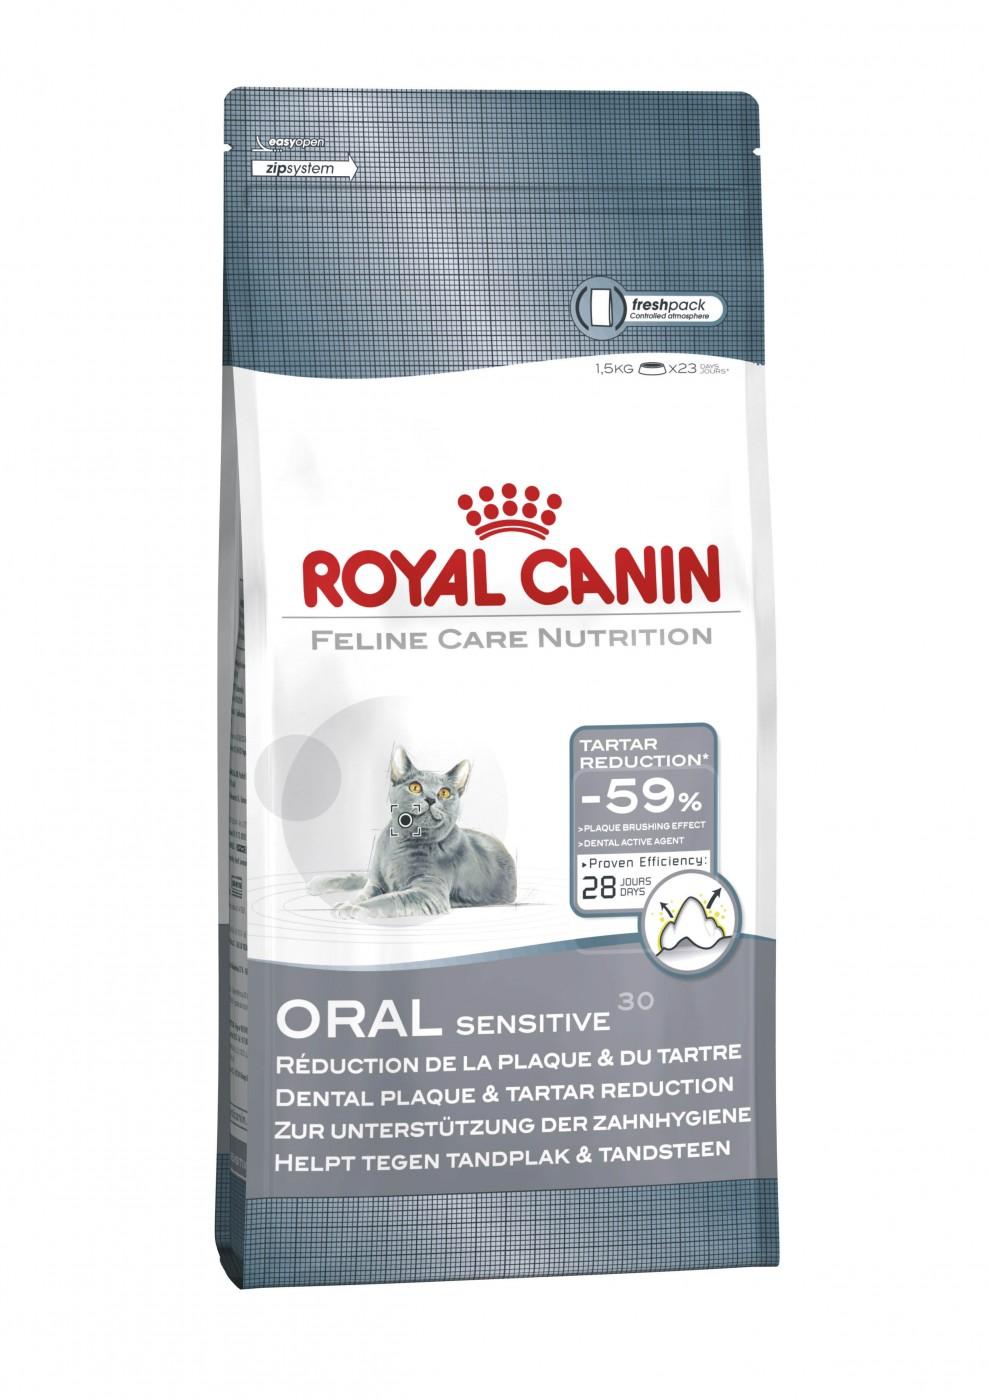 Royal Canin Oral Sensitive 30 | 400g Katzenfutter